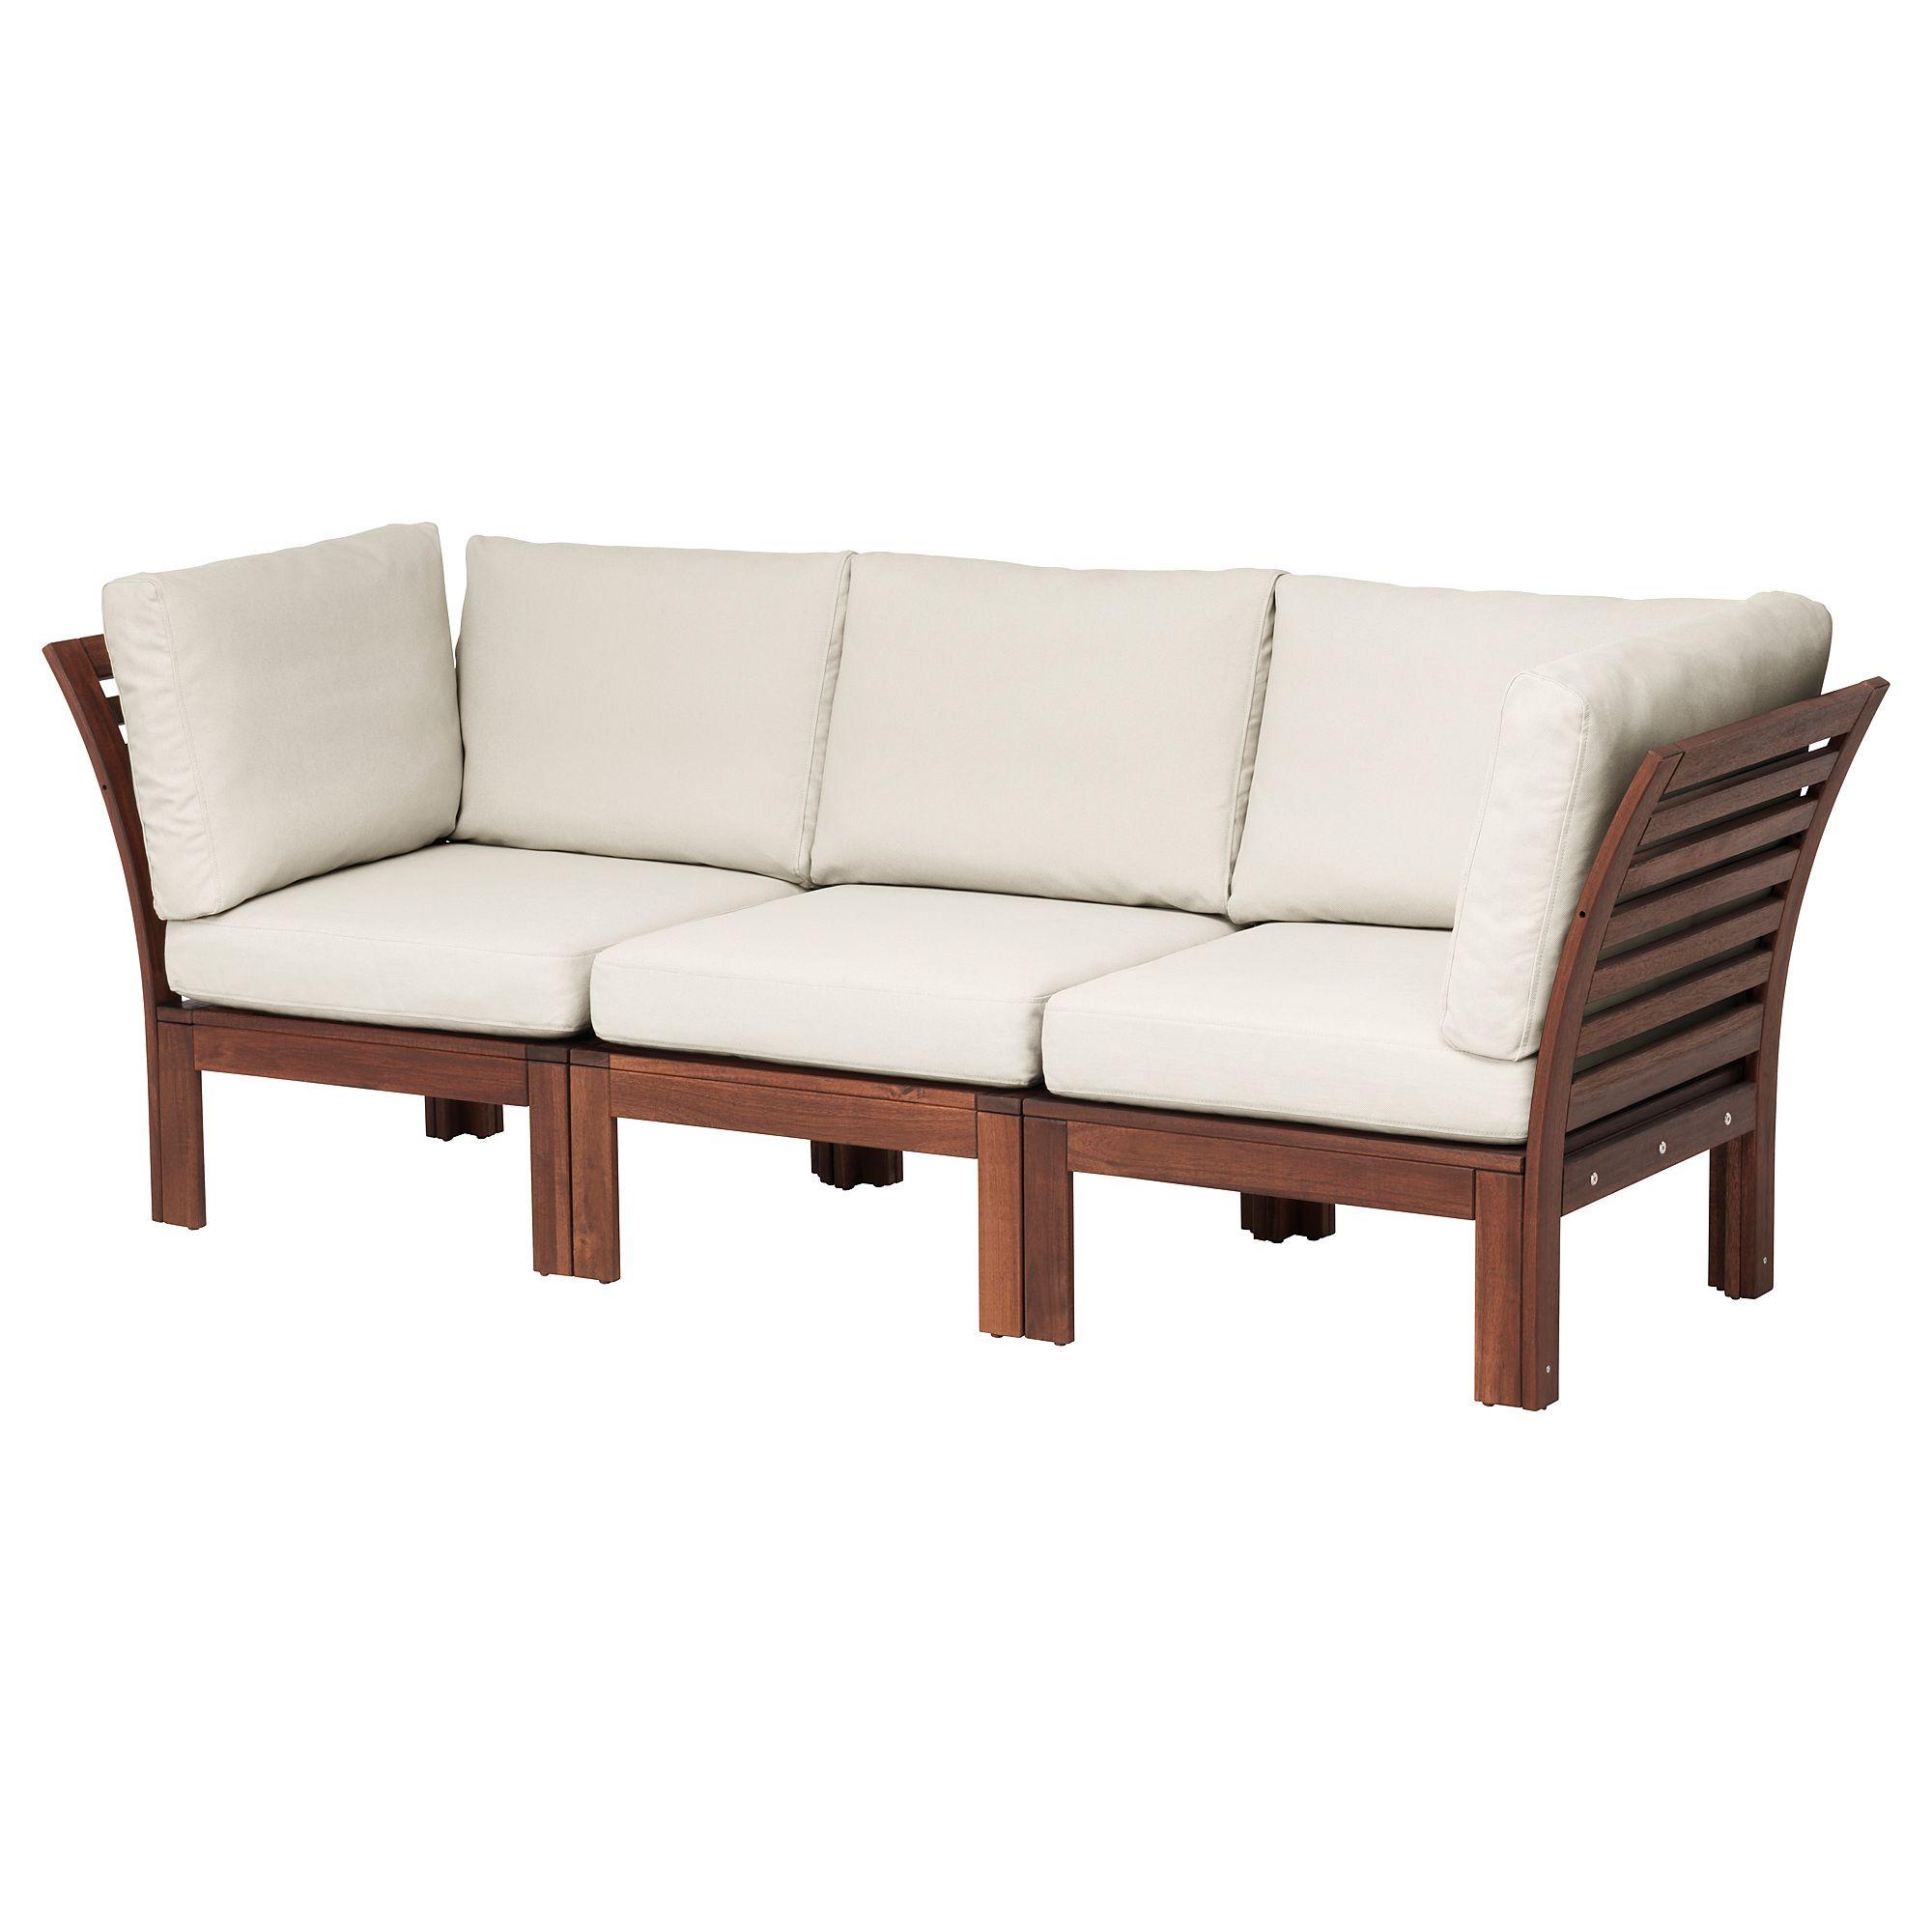 Applaro 3 Seat Modular Sofa Outdoor Brown Stained Froson Duvholmen Beige Canape Modulaire Mobilier De Salon Et Mobilier Jardin